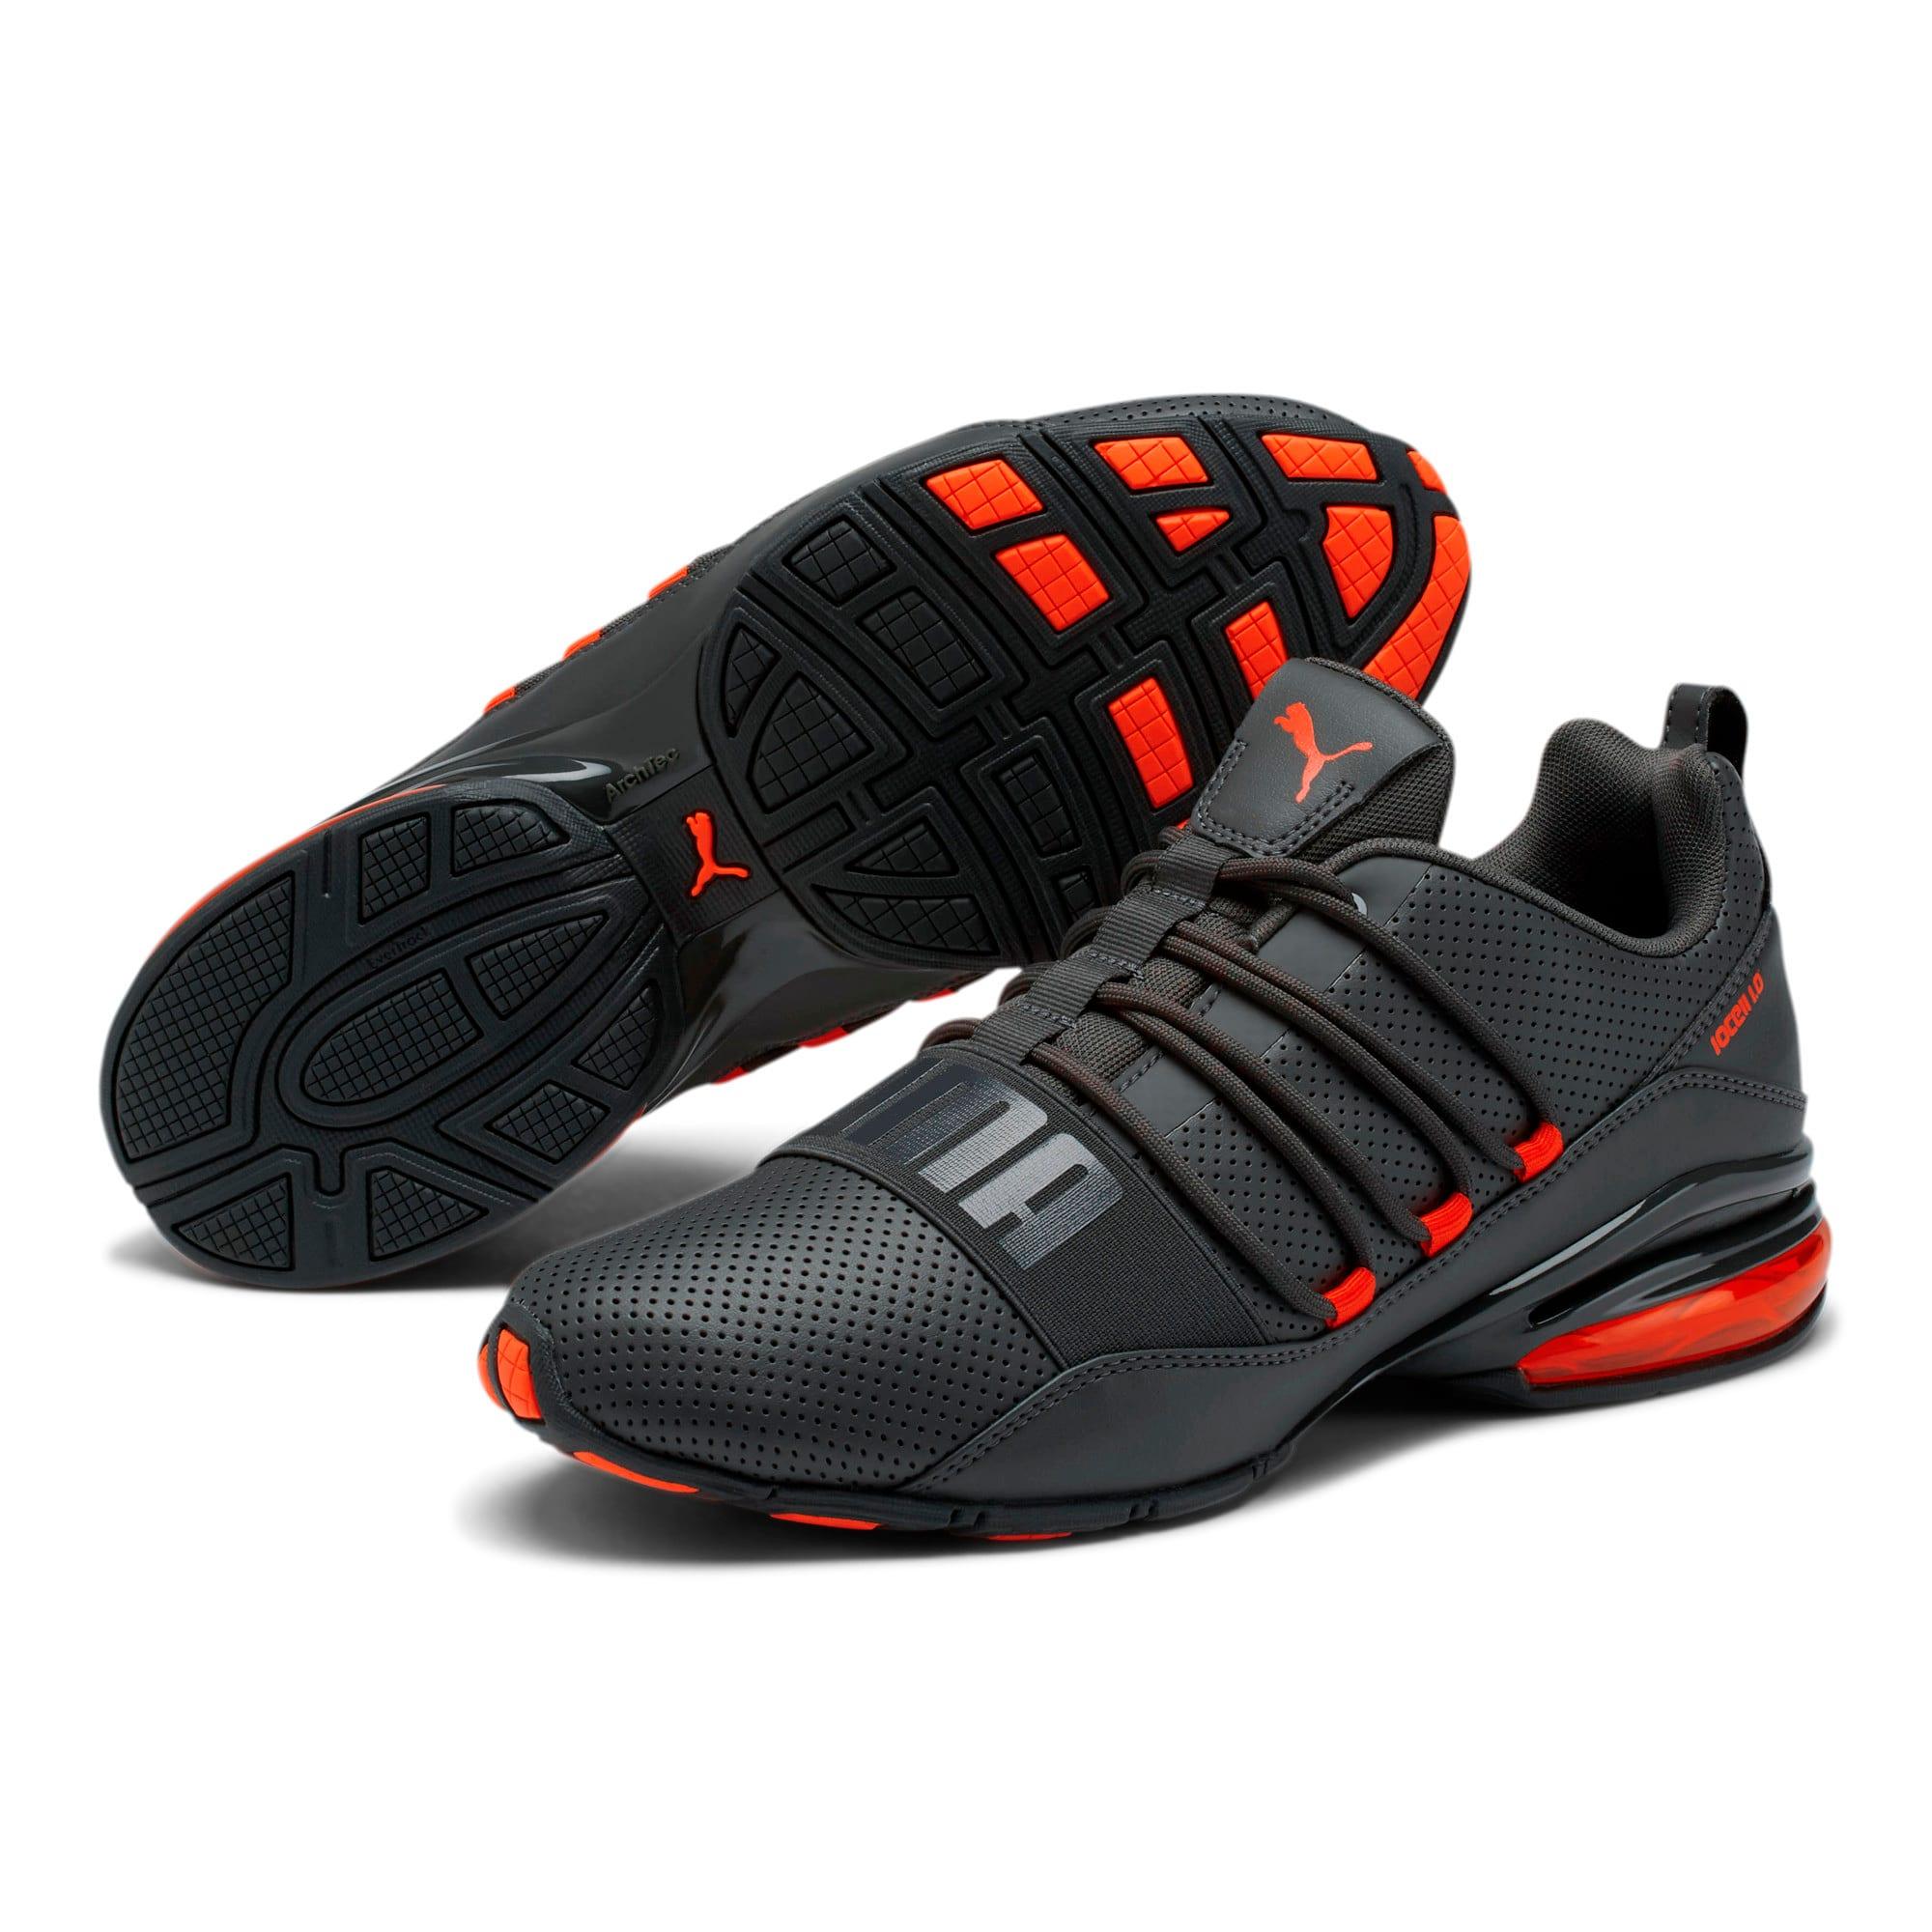 Thumbnail 2 of Cell Regulate Men's Running Shoes, Dark Shadow-Nrgy Red, medium